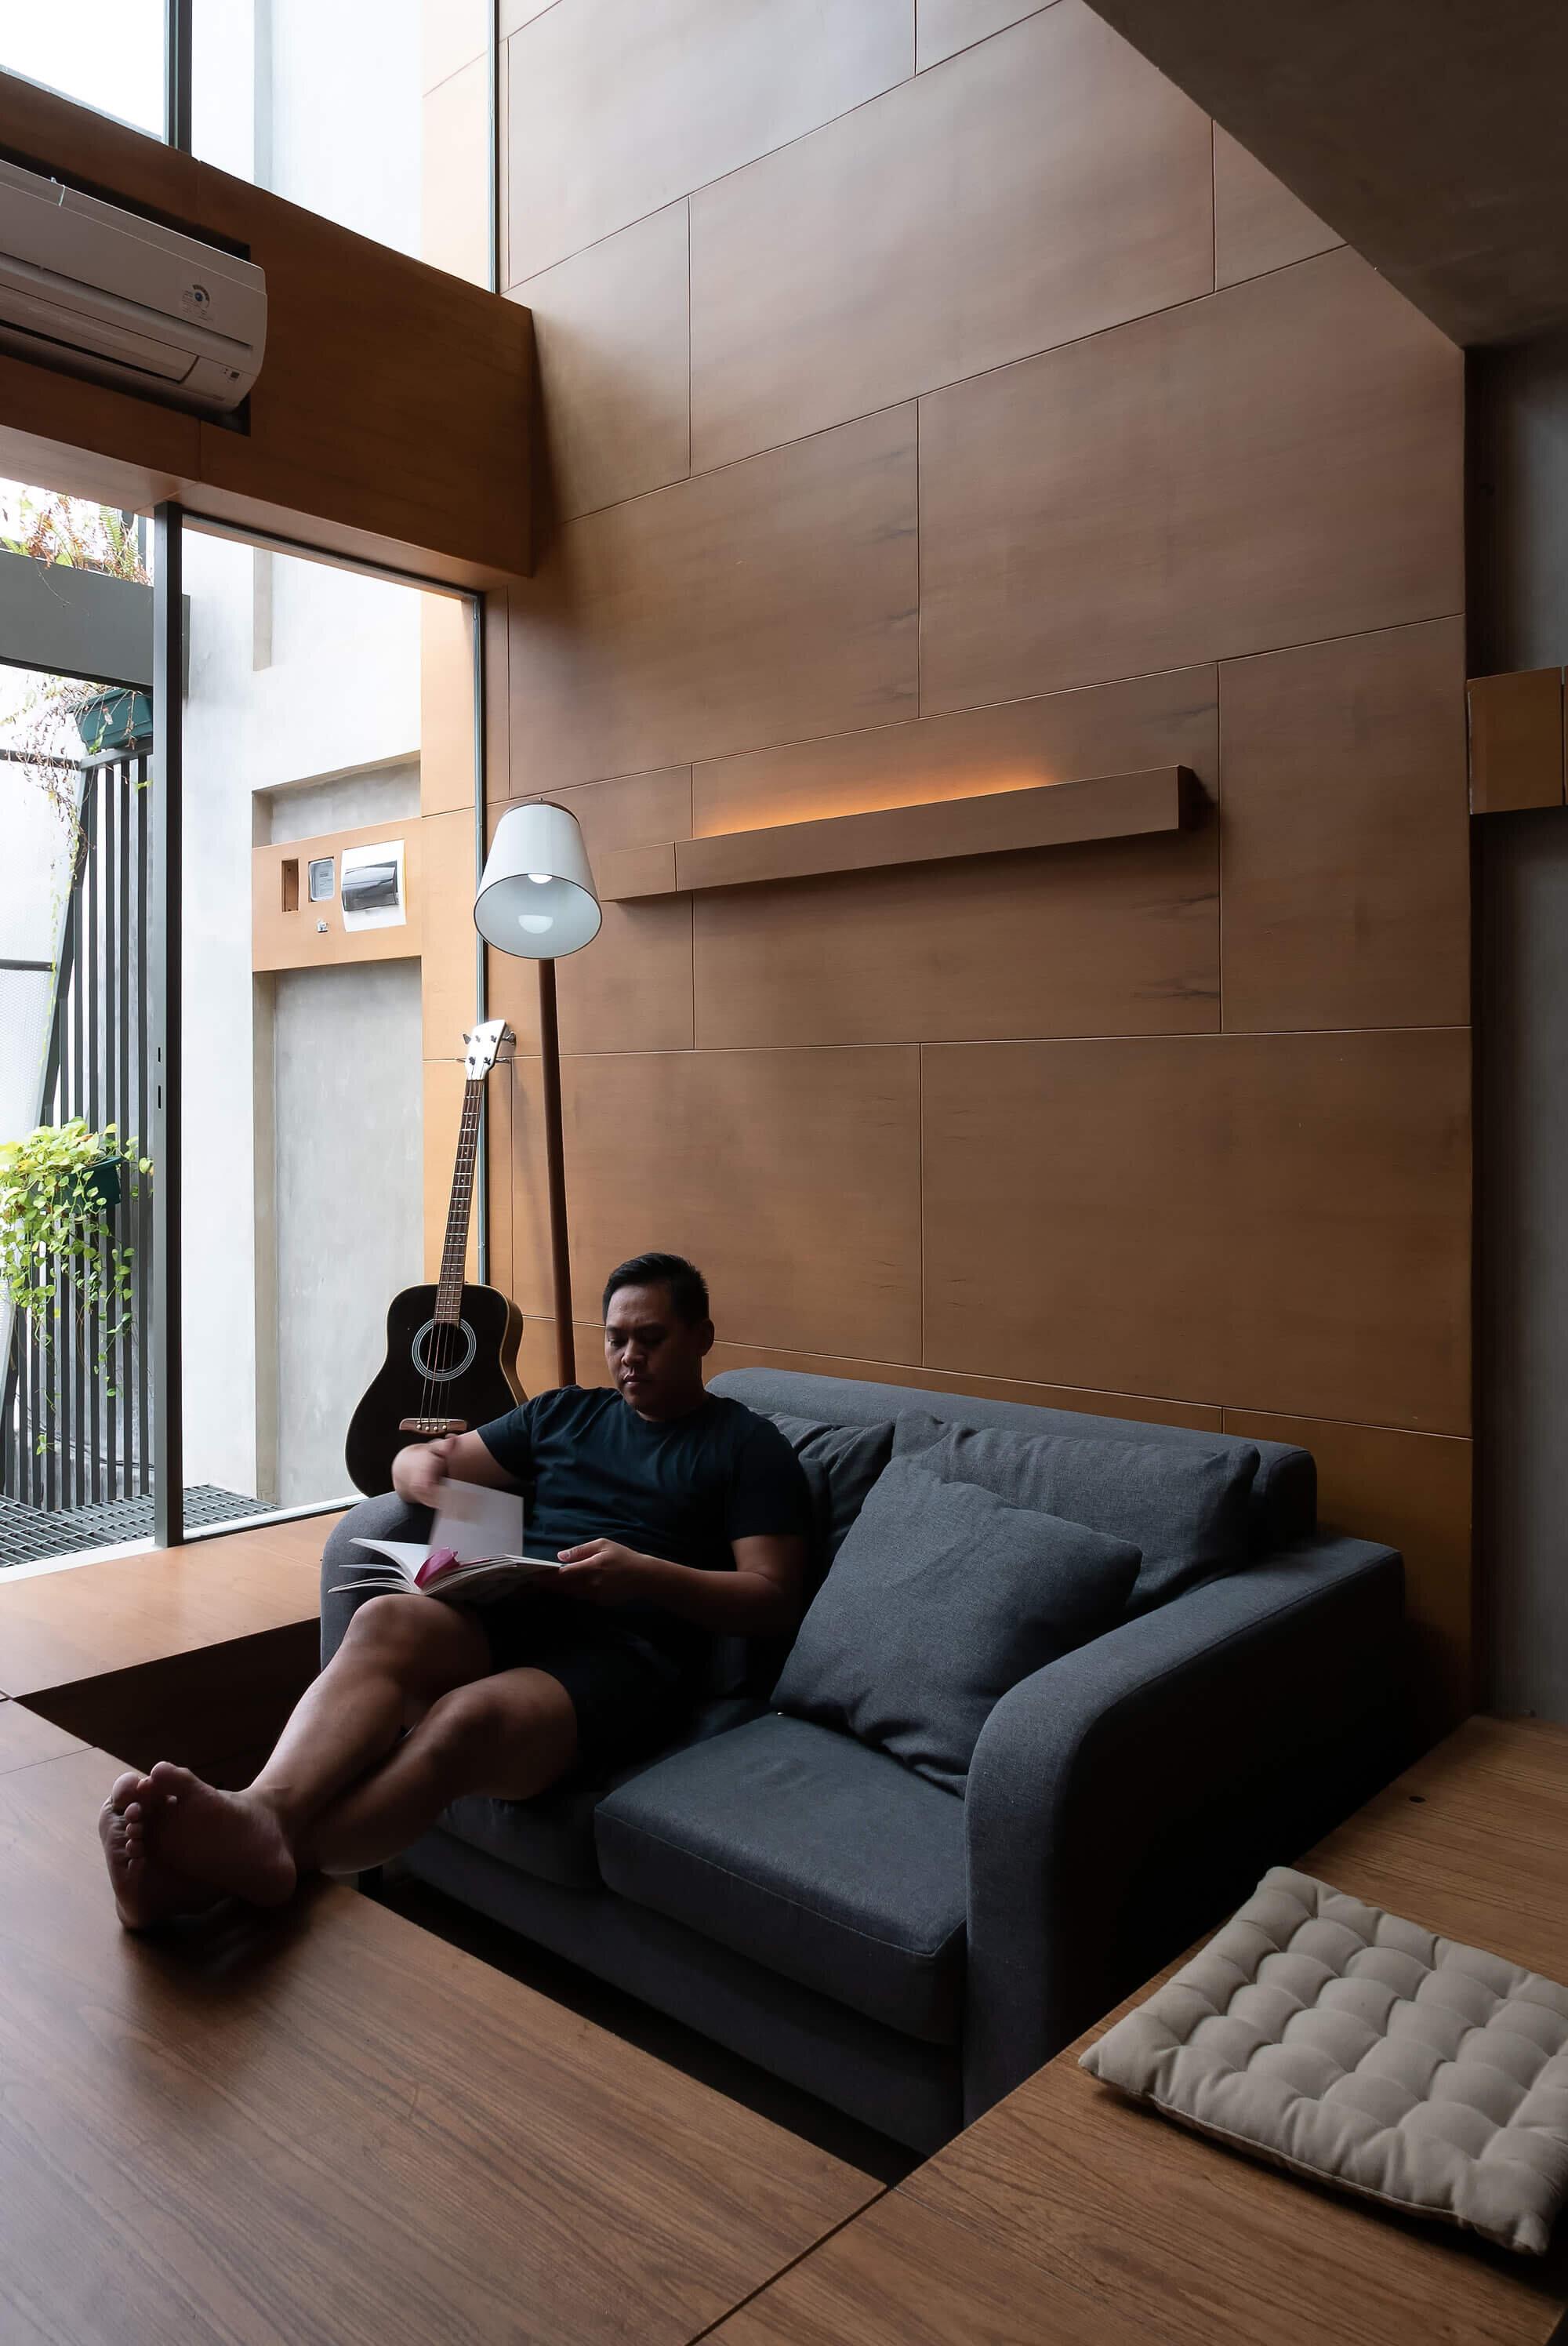 3500-Millimetre-House-Ago-Architects-Indonesia-18